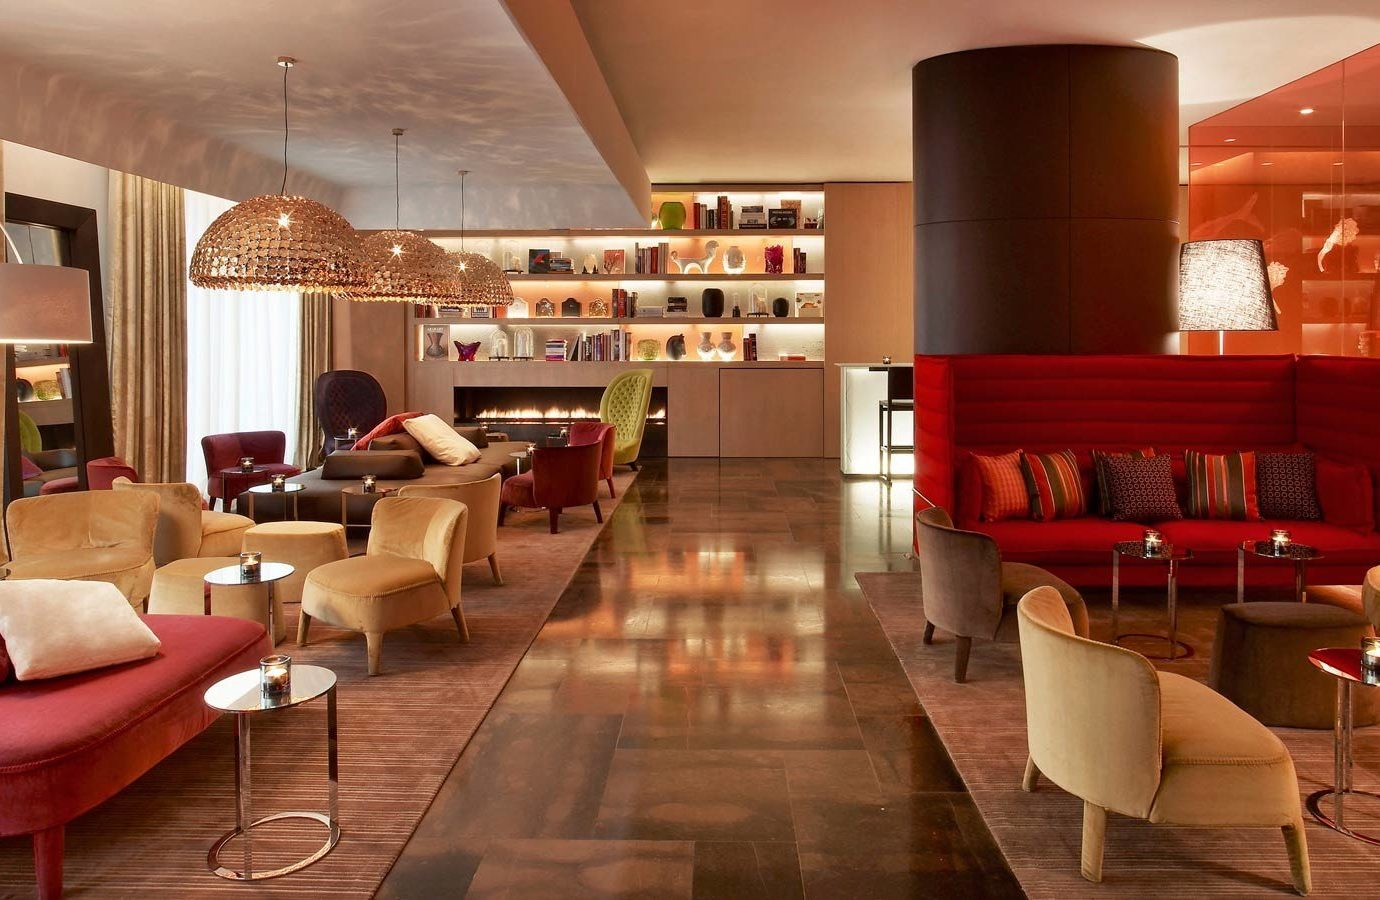 Hotels Luxury Travel indoor floor room Living ceiling interior design Lobby chair living room furniture restaurant café interior designer flooring table loft area